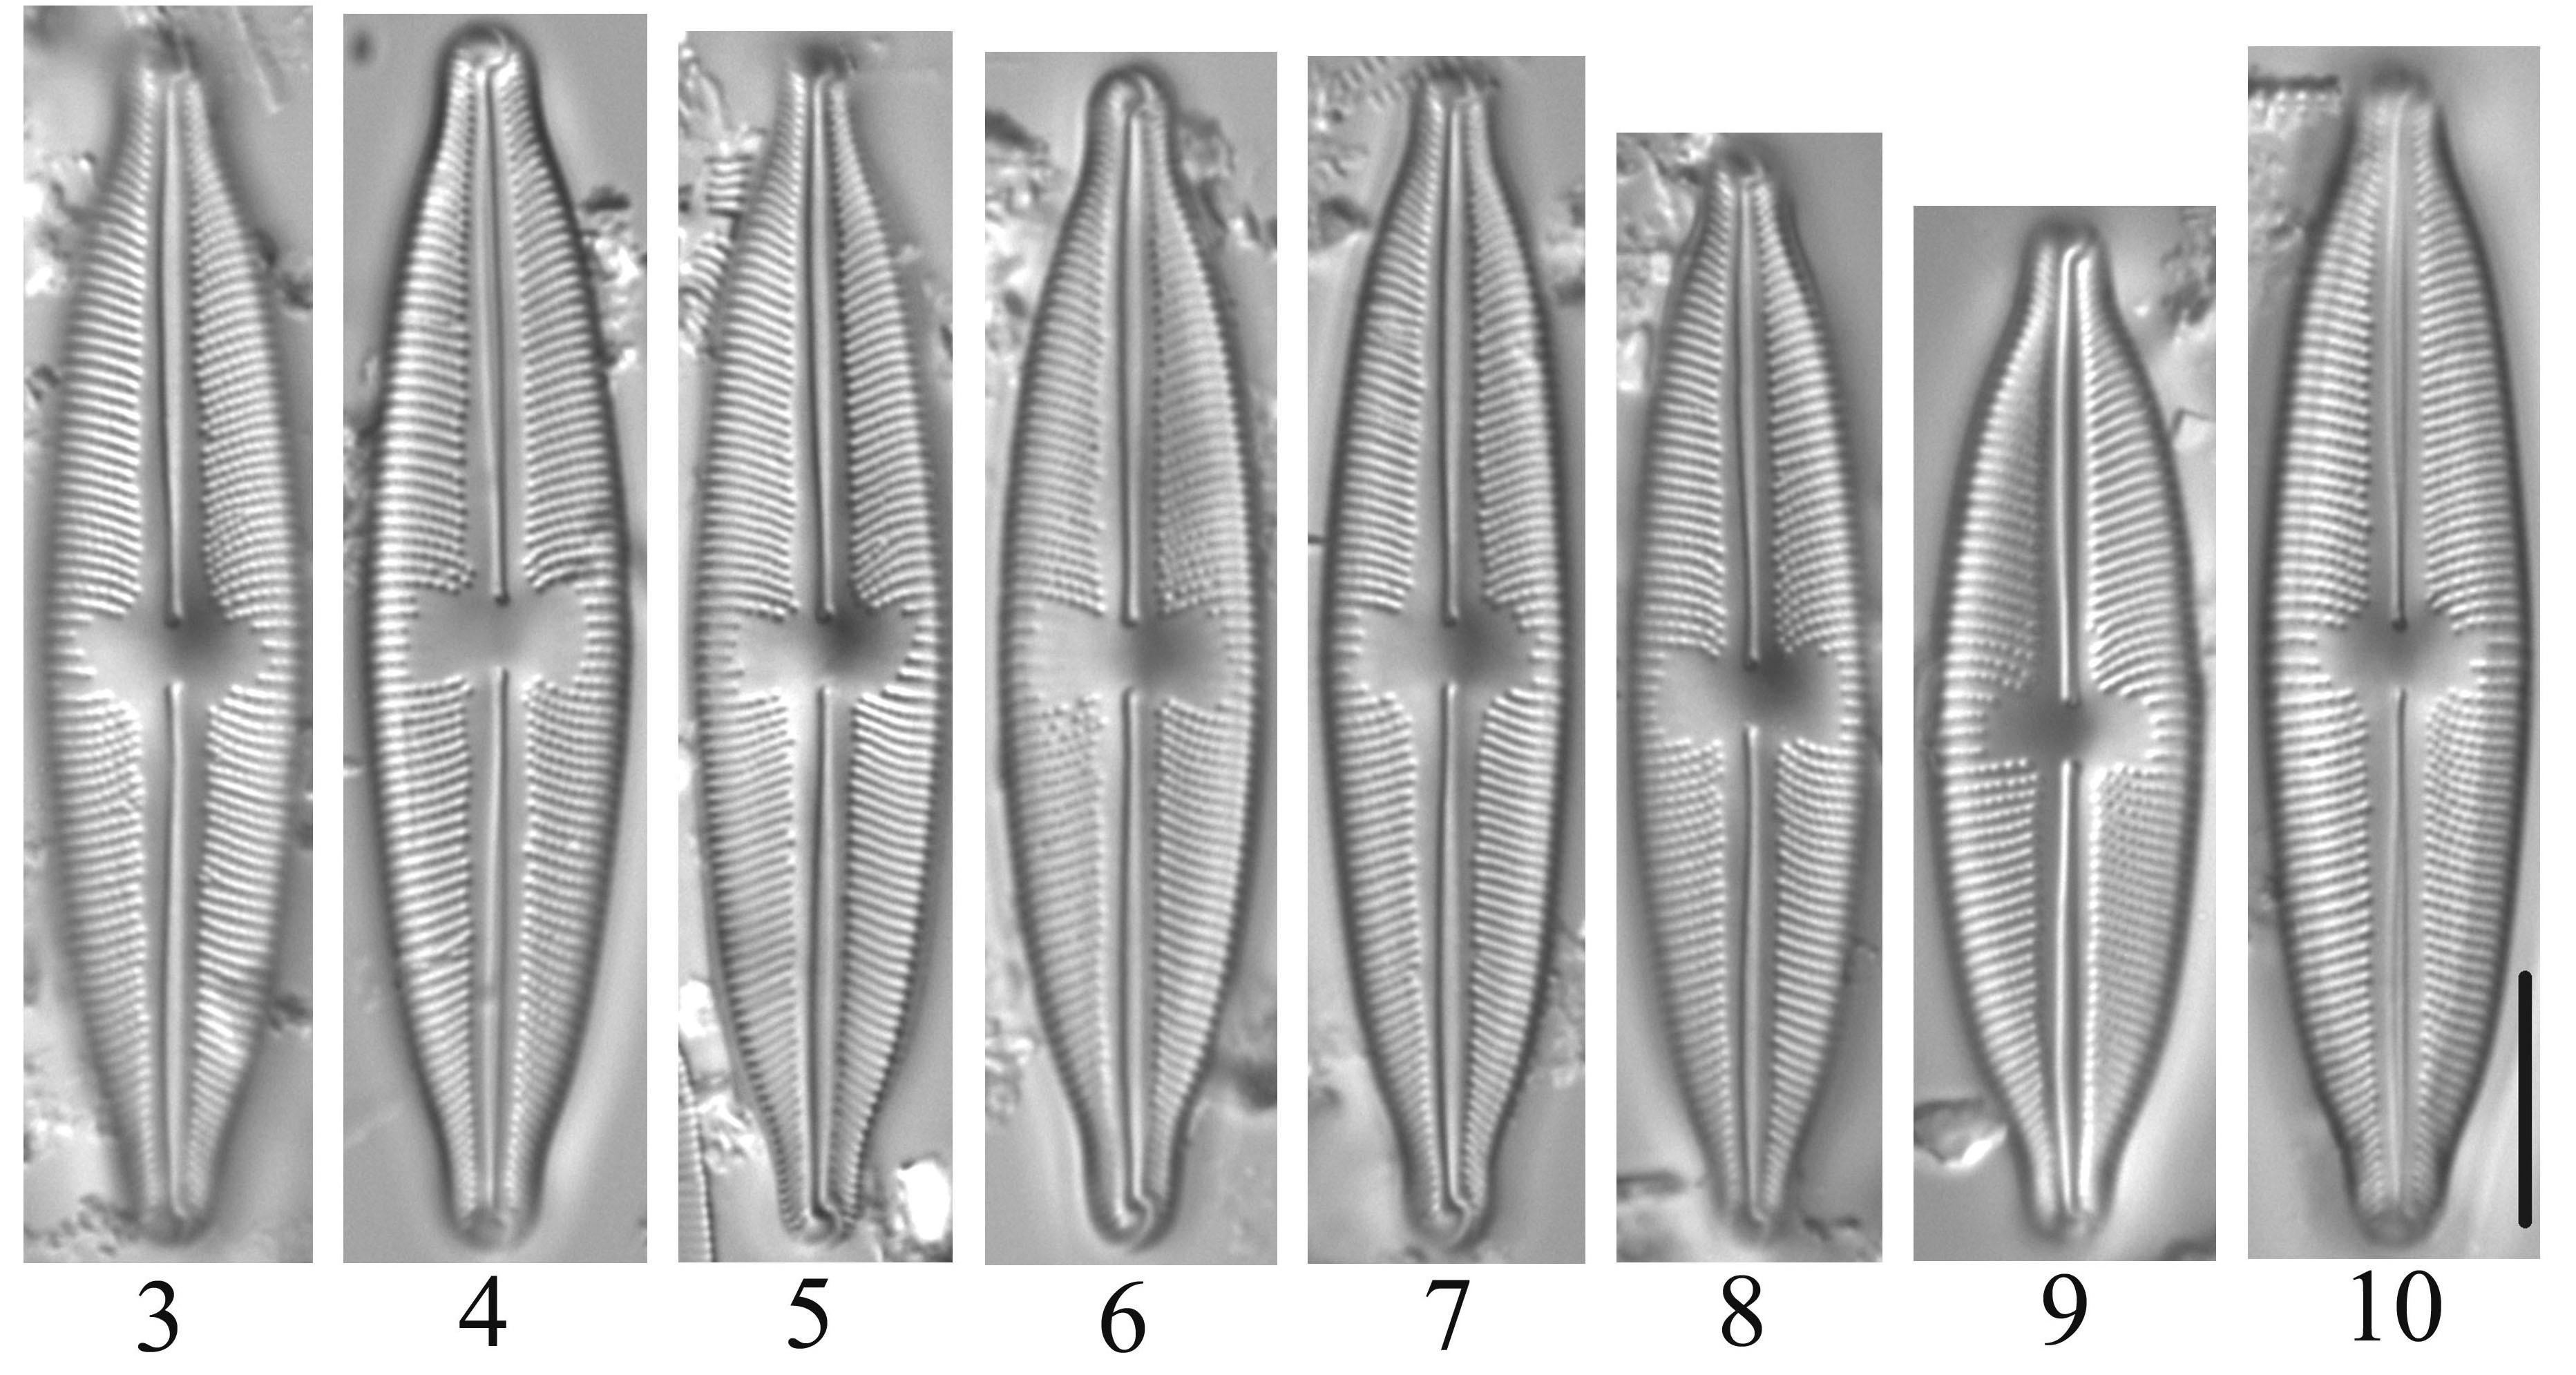 Cymbopleura Laszlorum Orig Imag 1